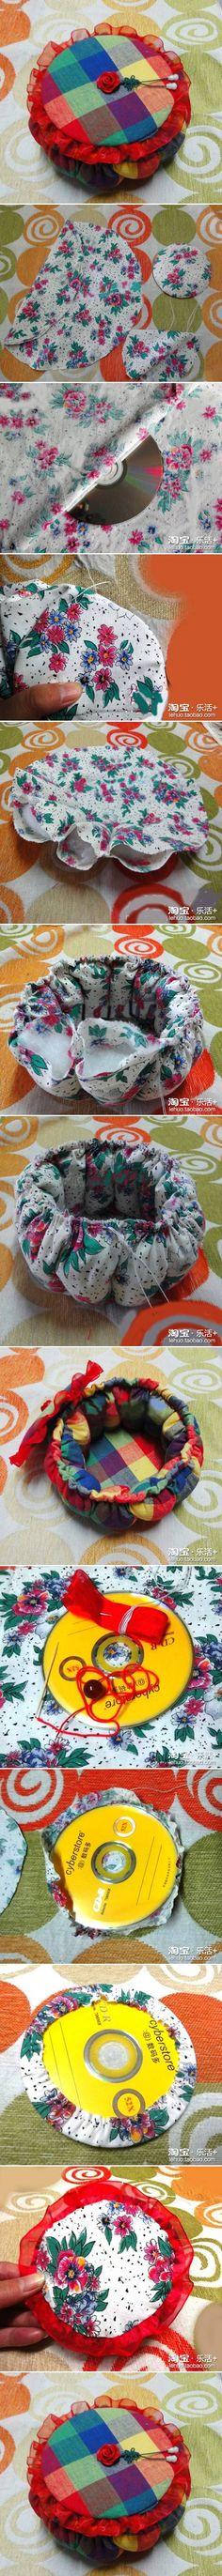 DIY Old CD Pumpkin Box DIY Projects | UsefulDIY.com Follow Us on Facebook ==> http://www.facebook.com/UsefulDiy